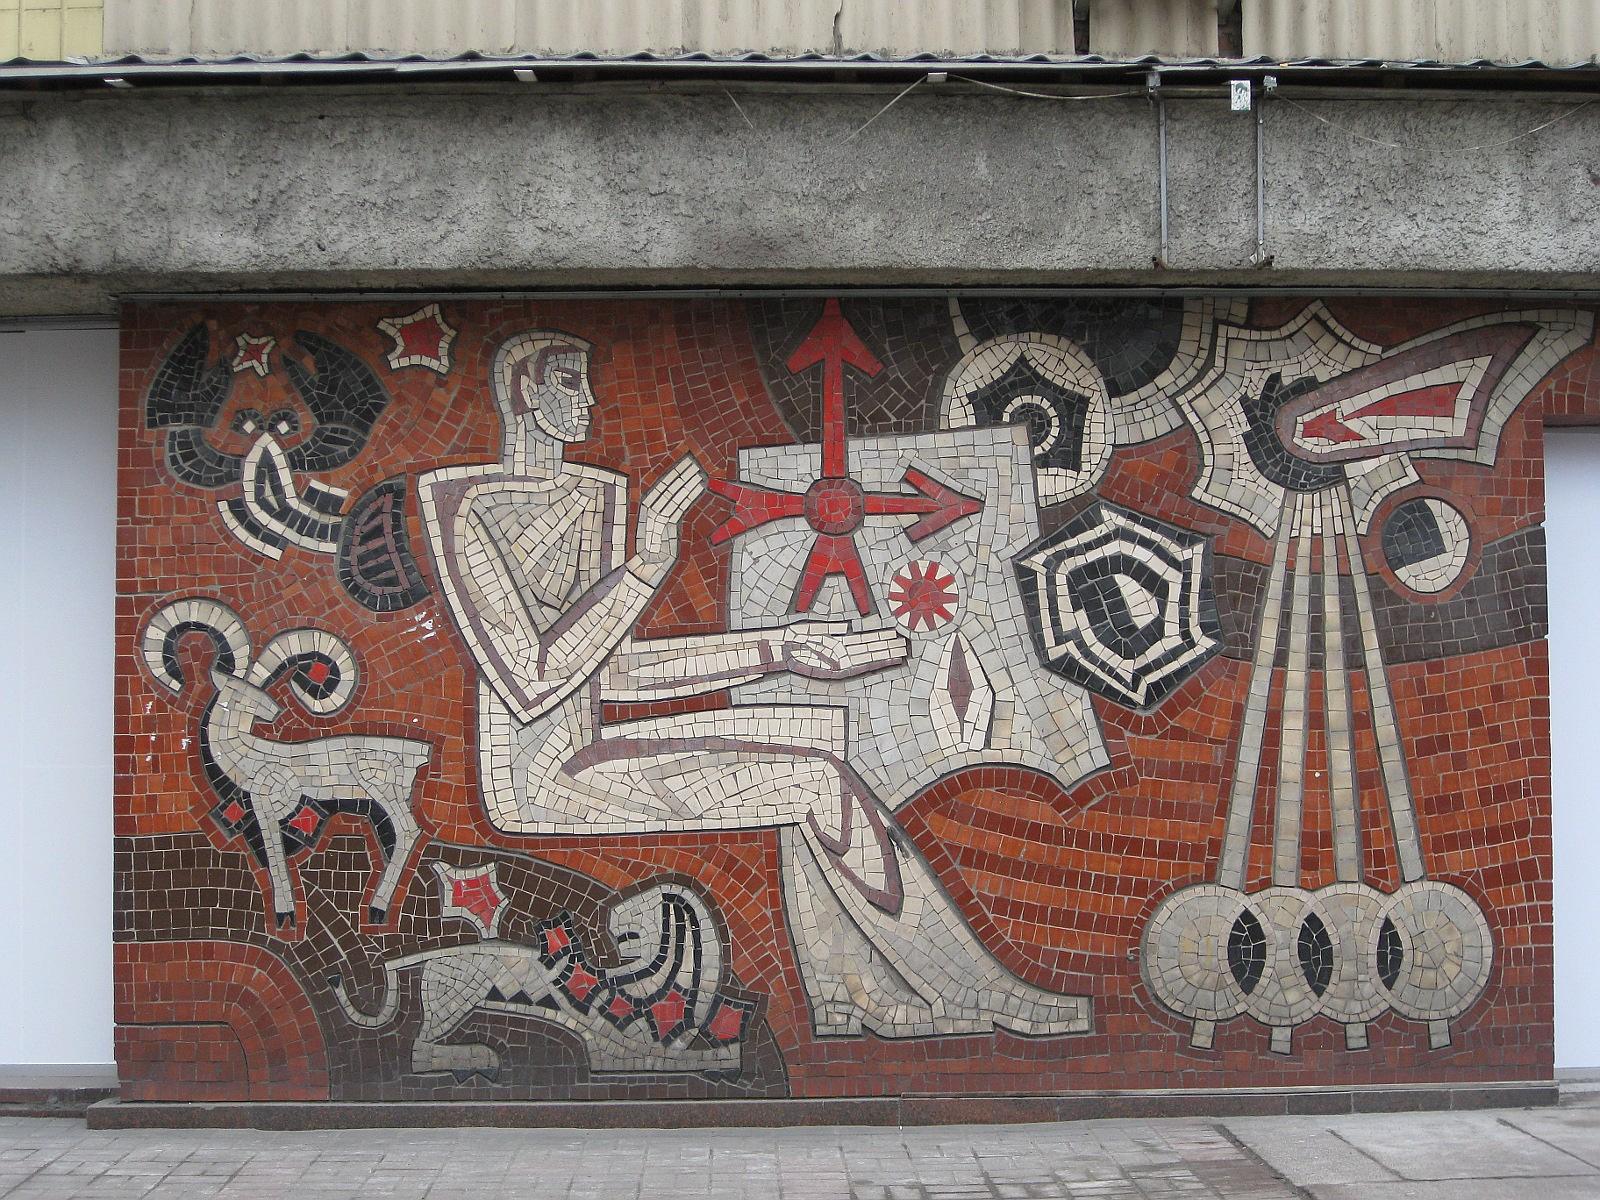 Советские мозаики : в Киеве фото, фотографии | РБК Украина: https://www.rbc.ua/styler/zhizn/top-5-sovetskih-mozaik-kieva-nahodyashchiesya-1462362405.html